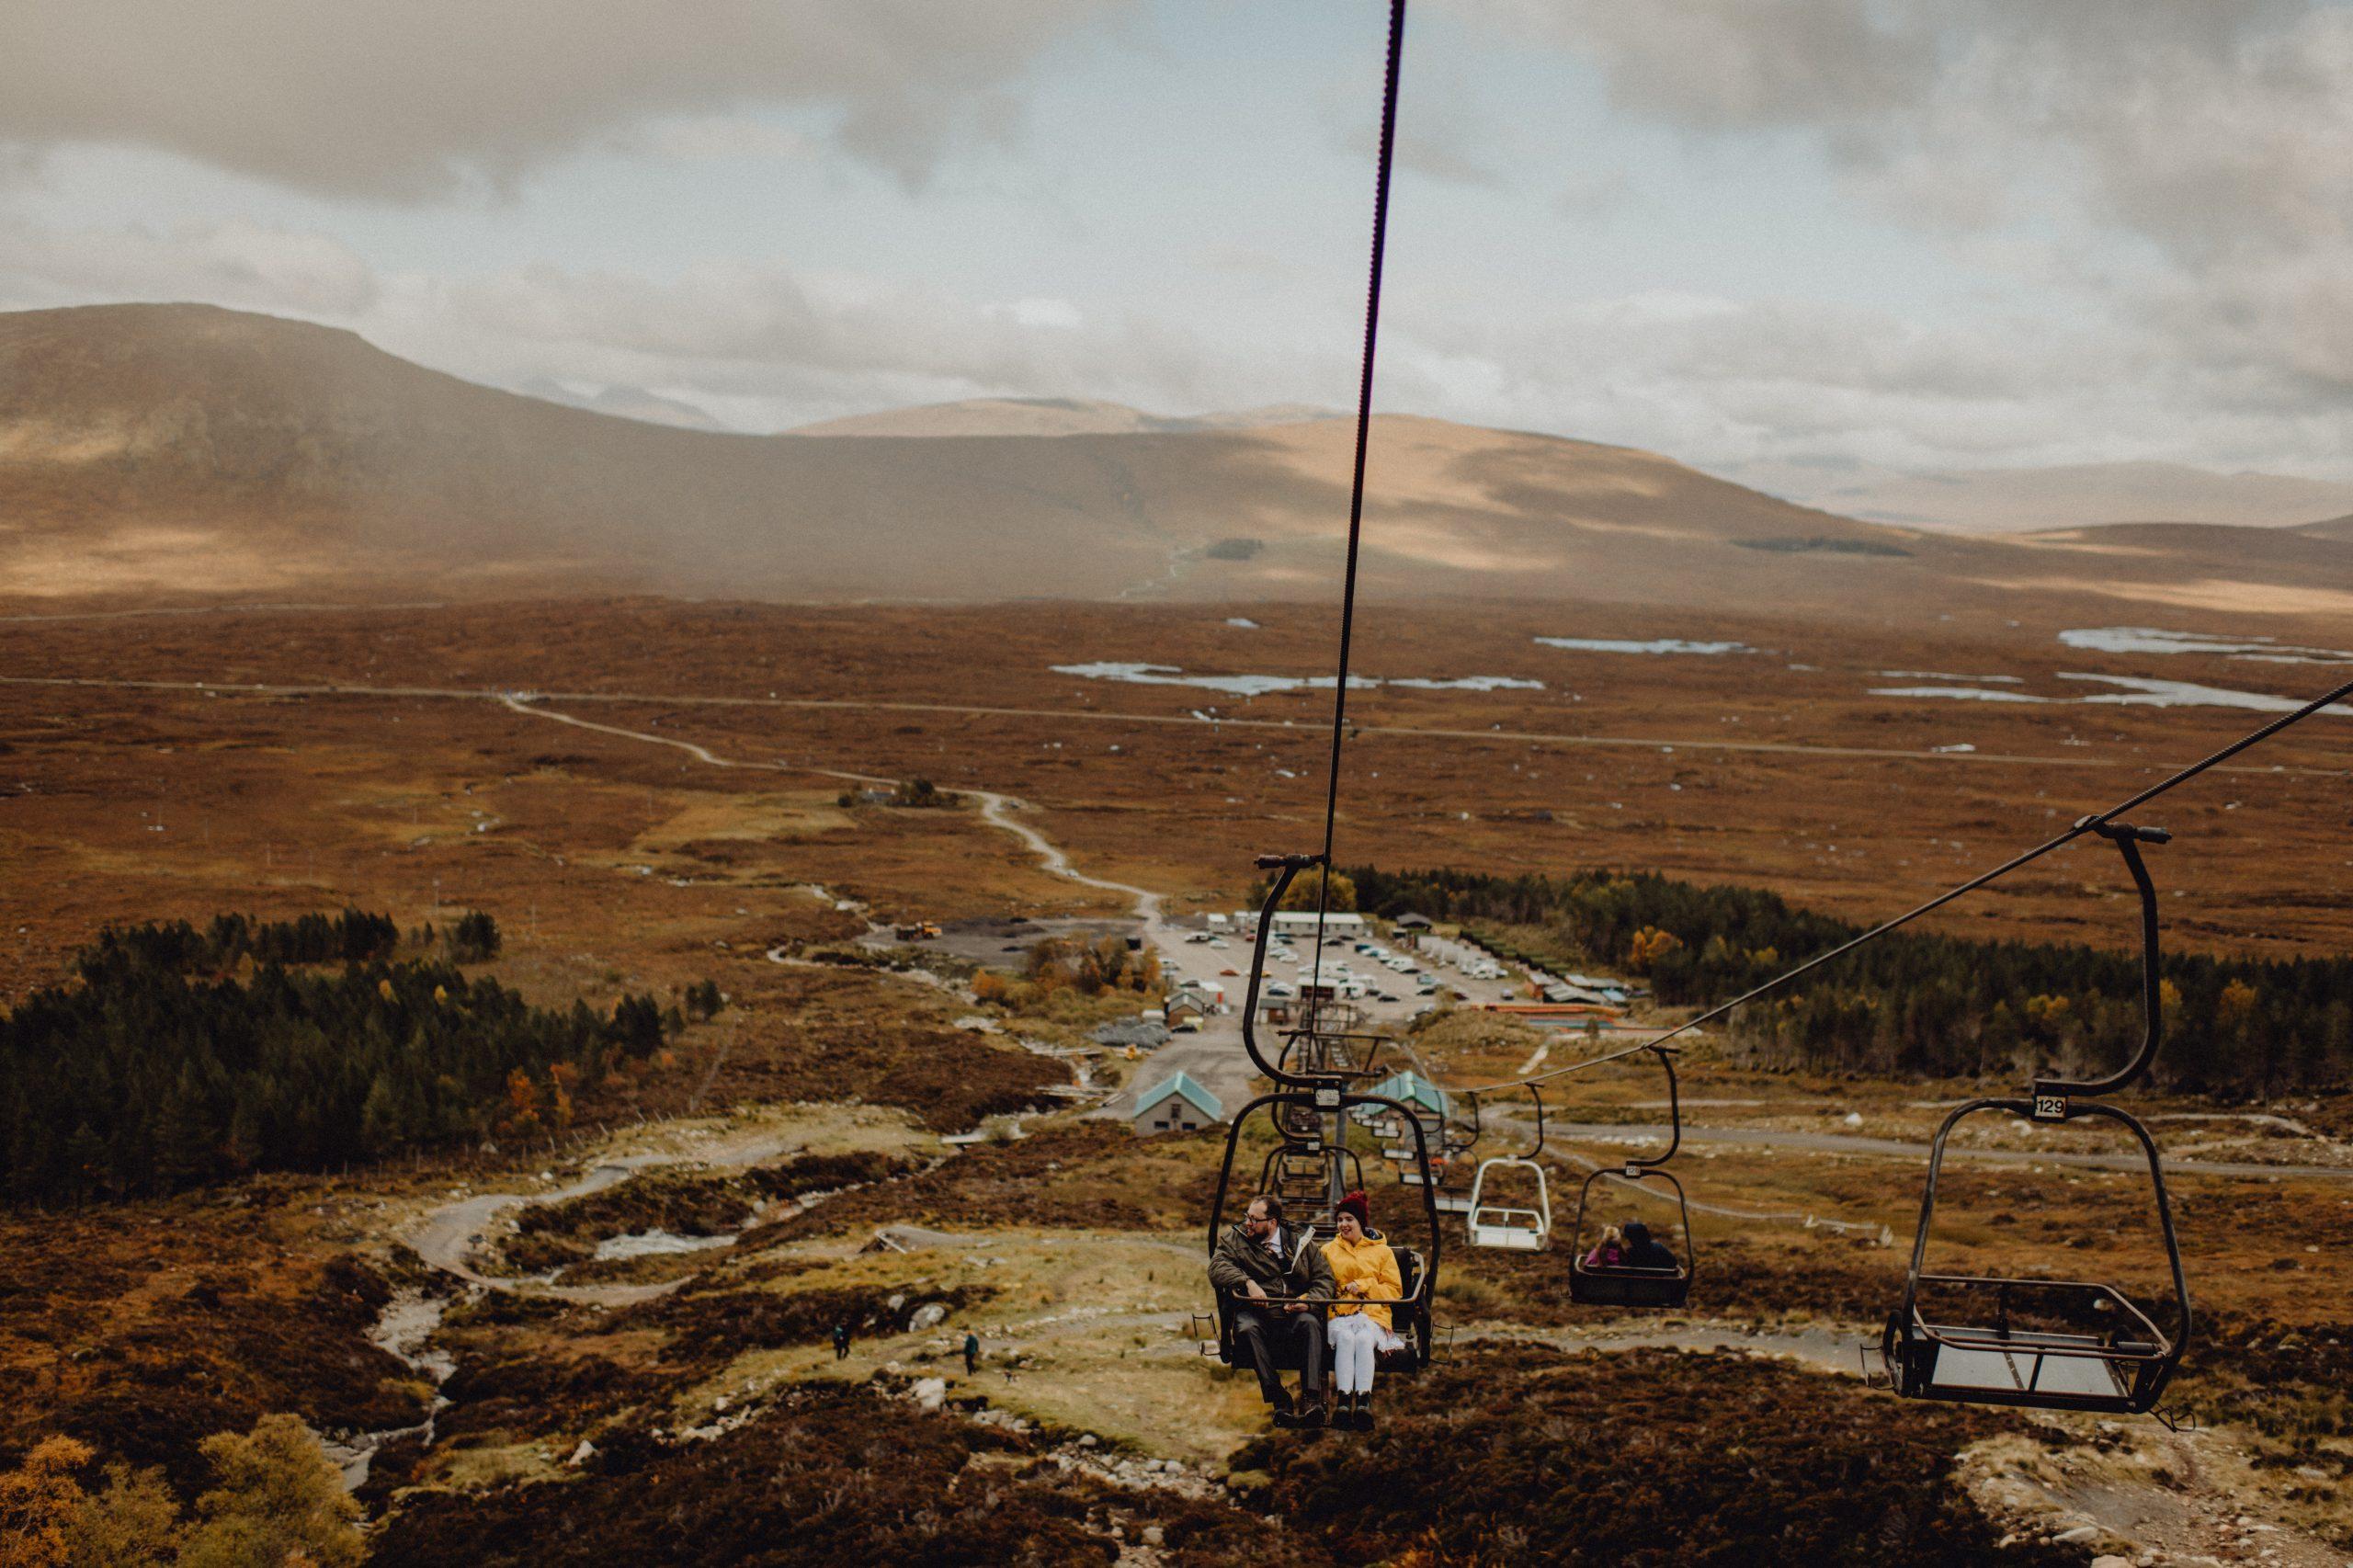 A wedding couple go up a ski lift at Glencoe in Scotland